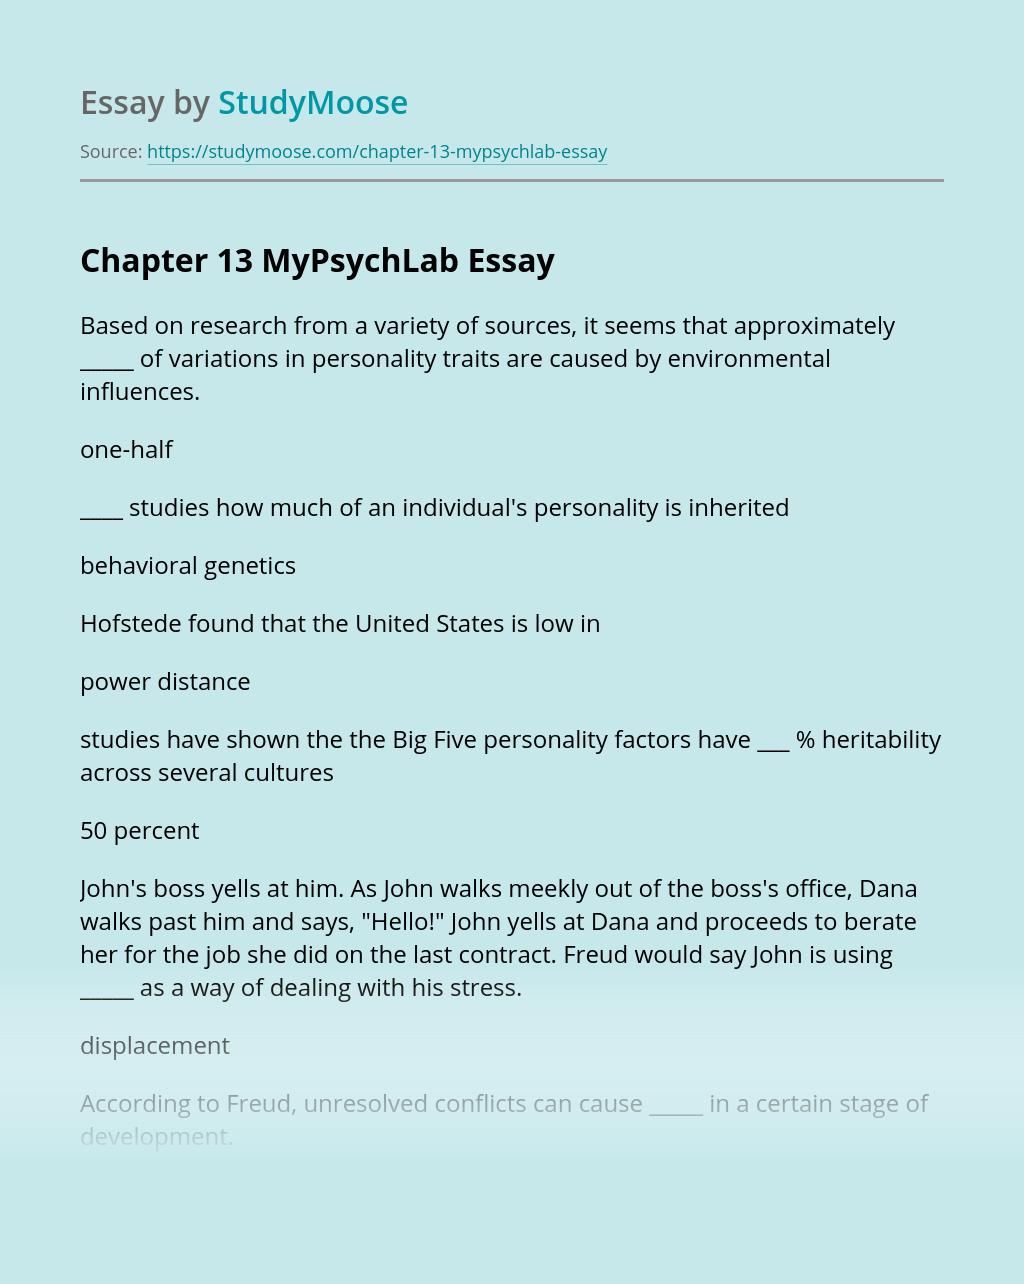 Chapter 13 MyPsychLab